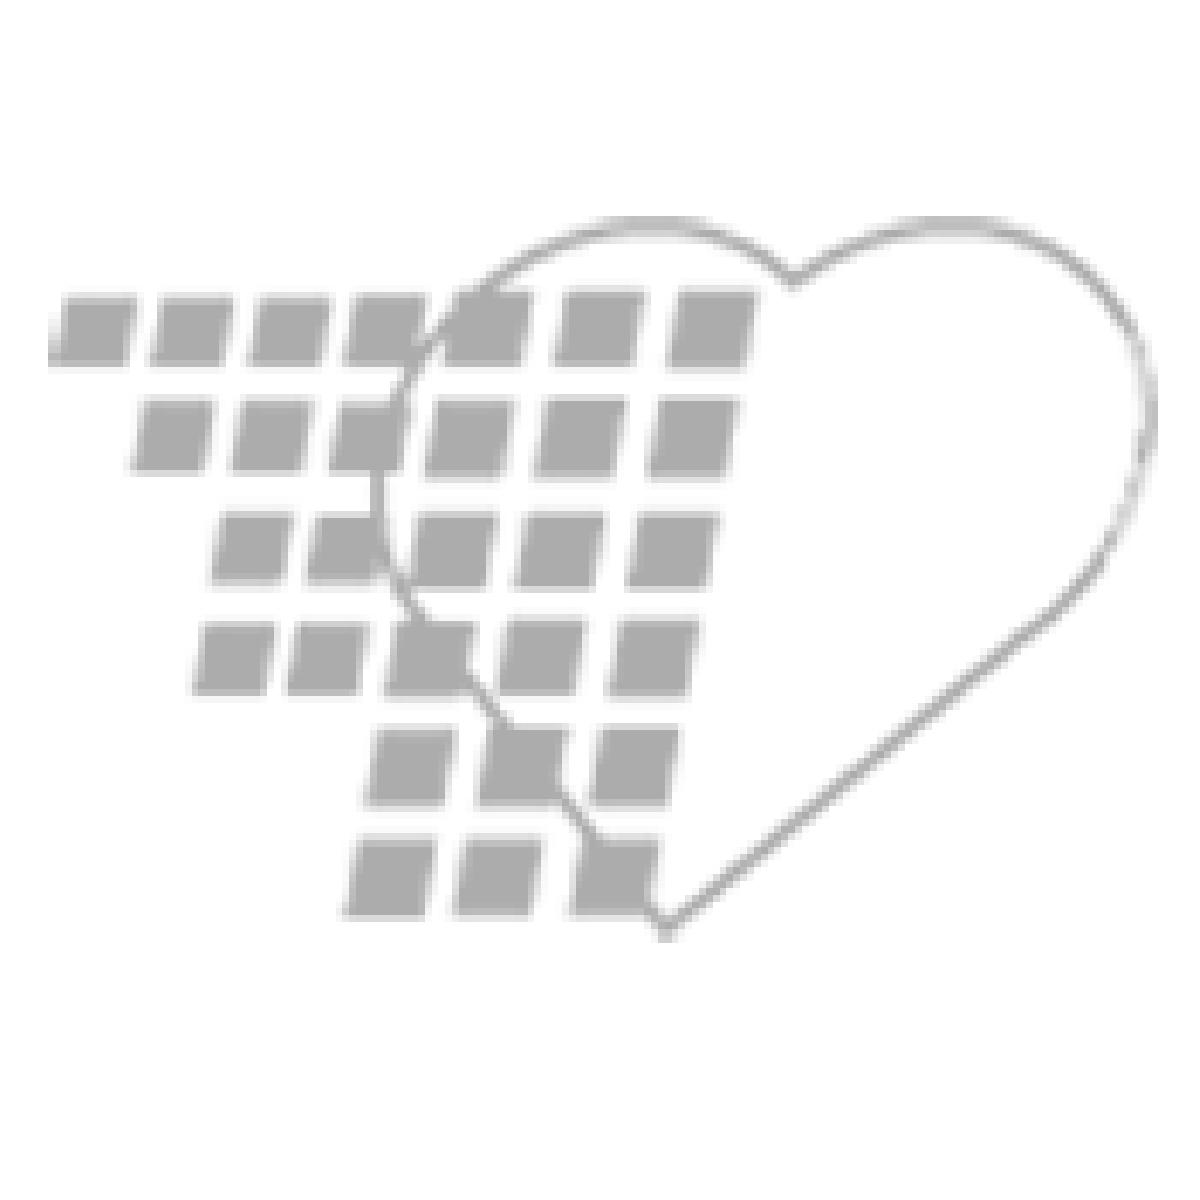 02-40-4160 Edan DUS 60 Digitial Diagnostic Ultrasound System